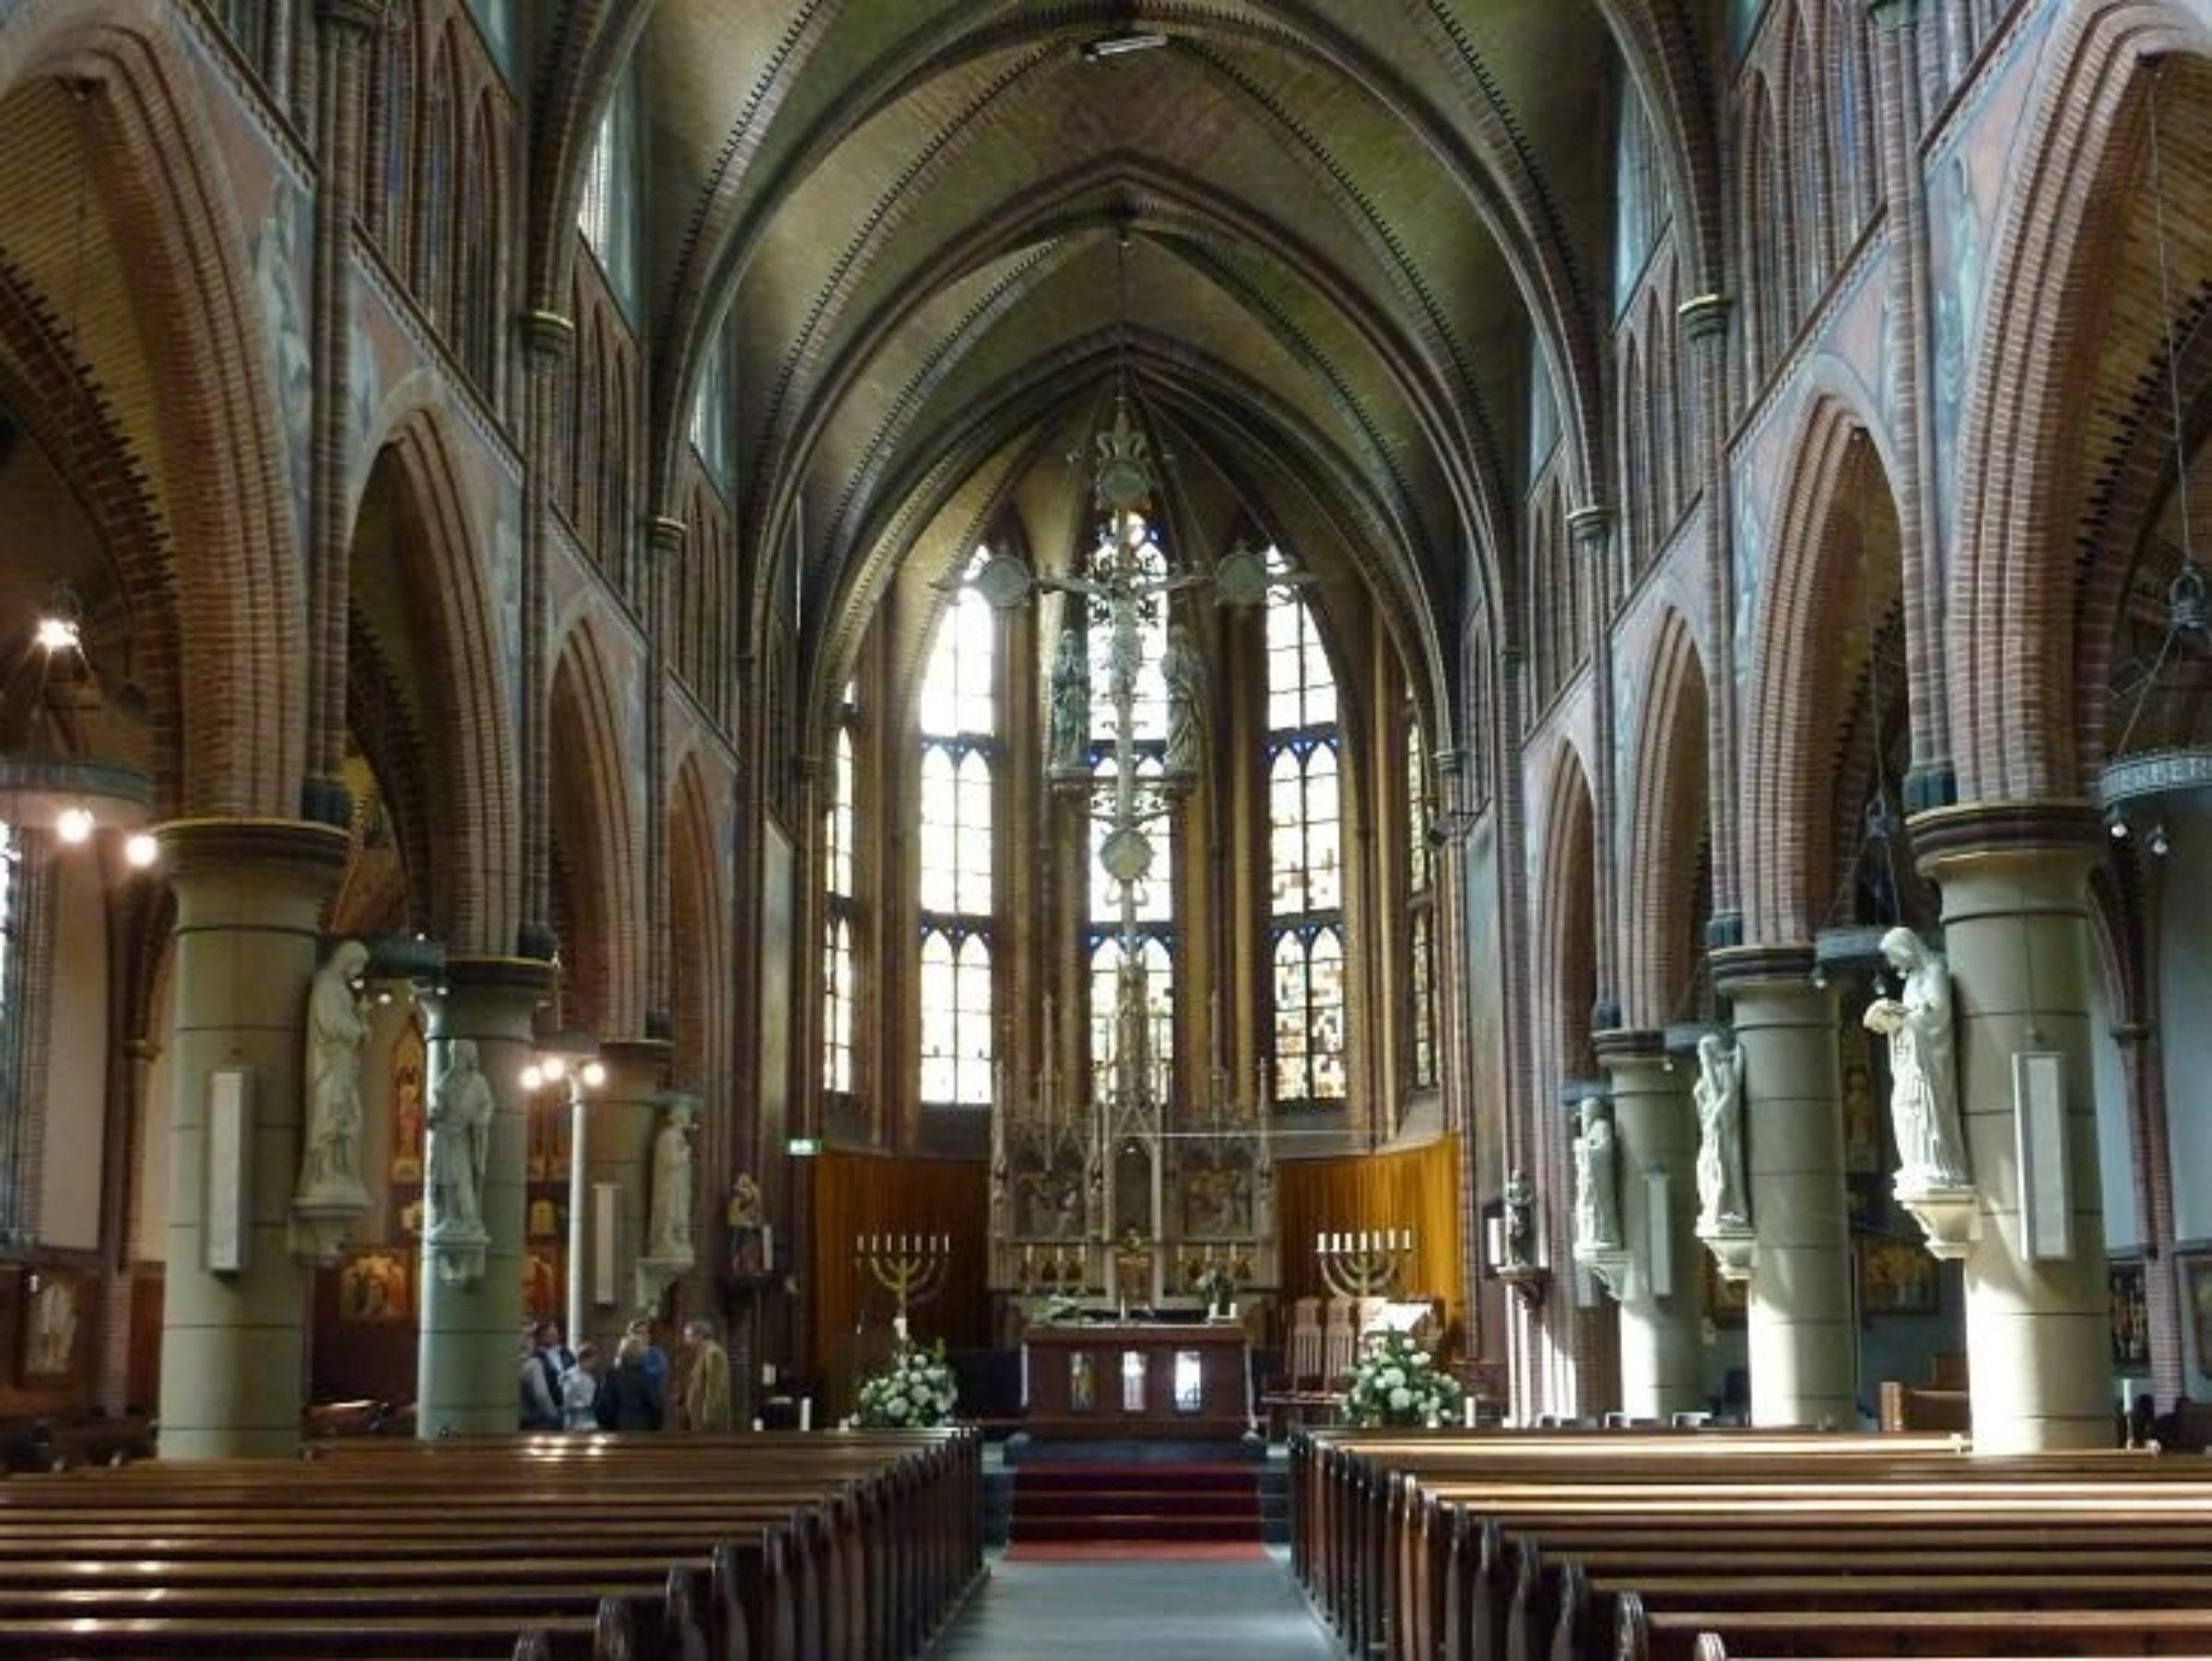 Sintjosephkerk